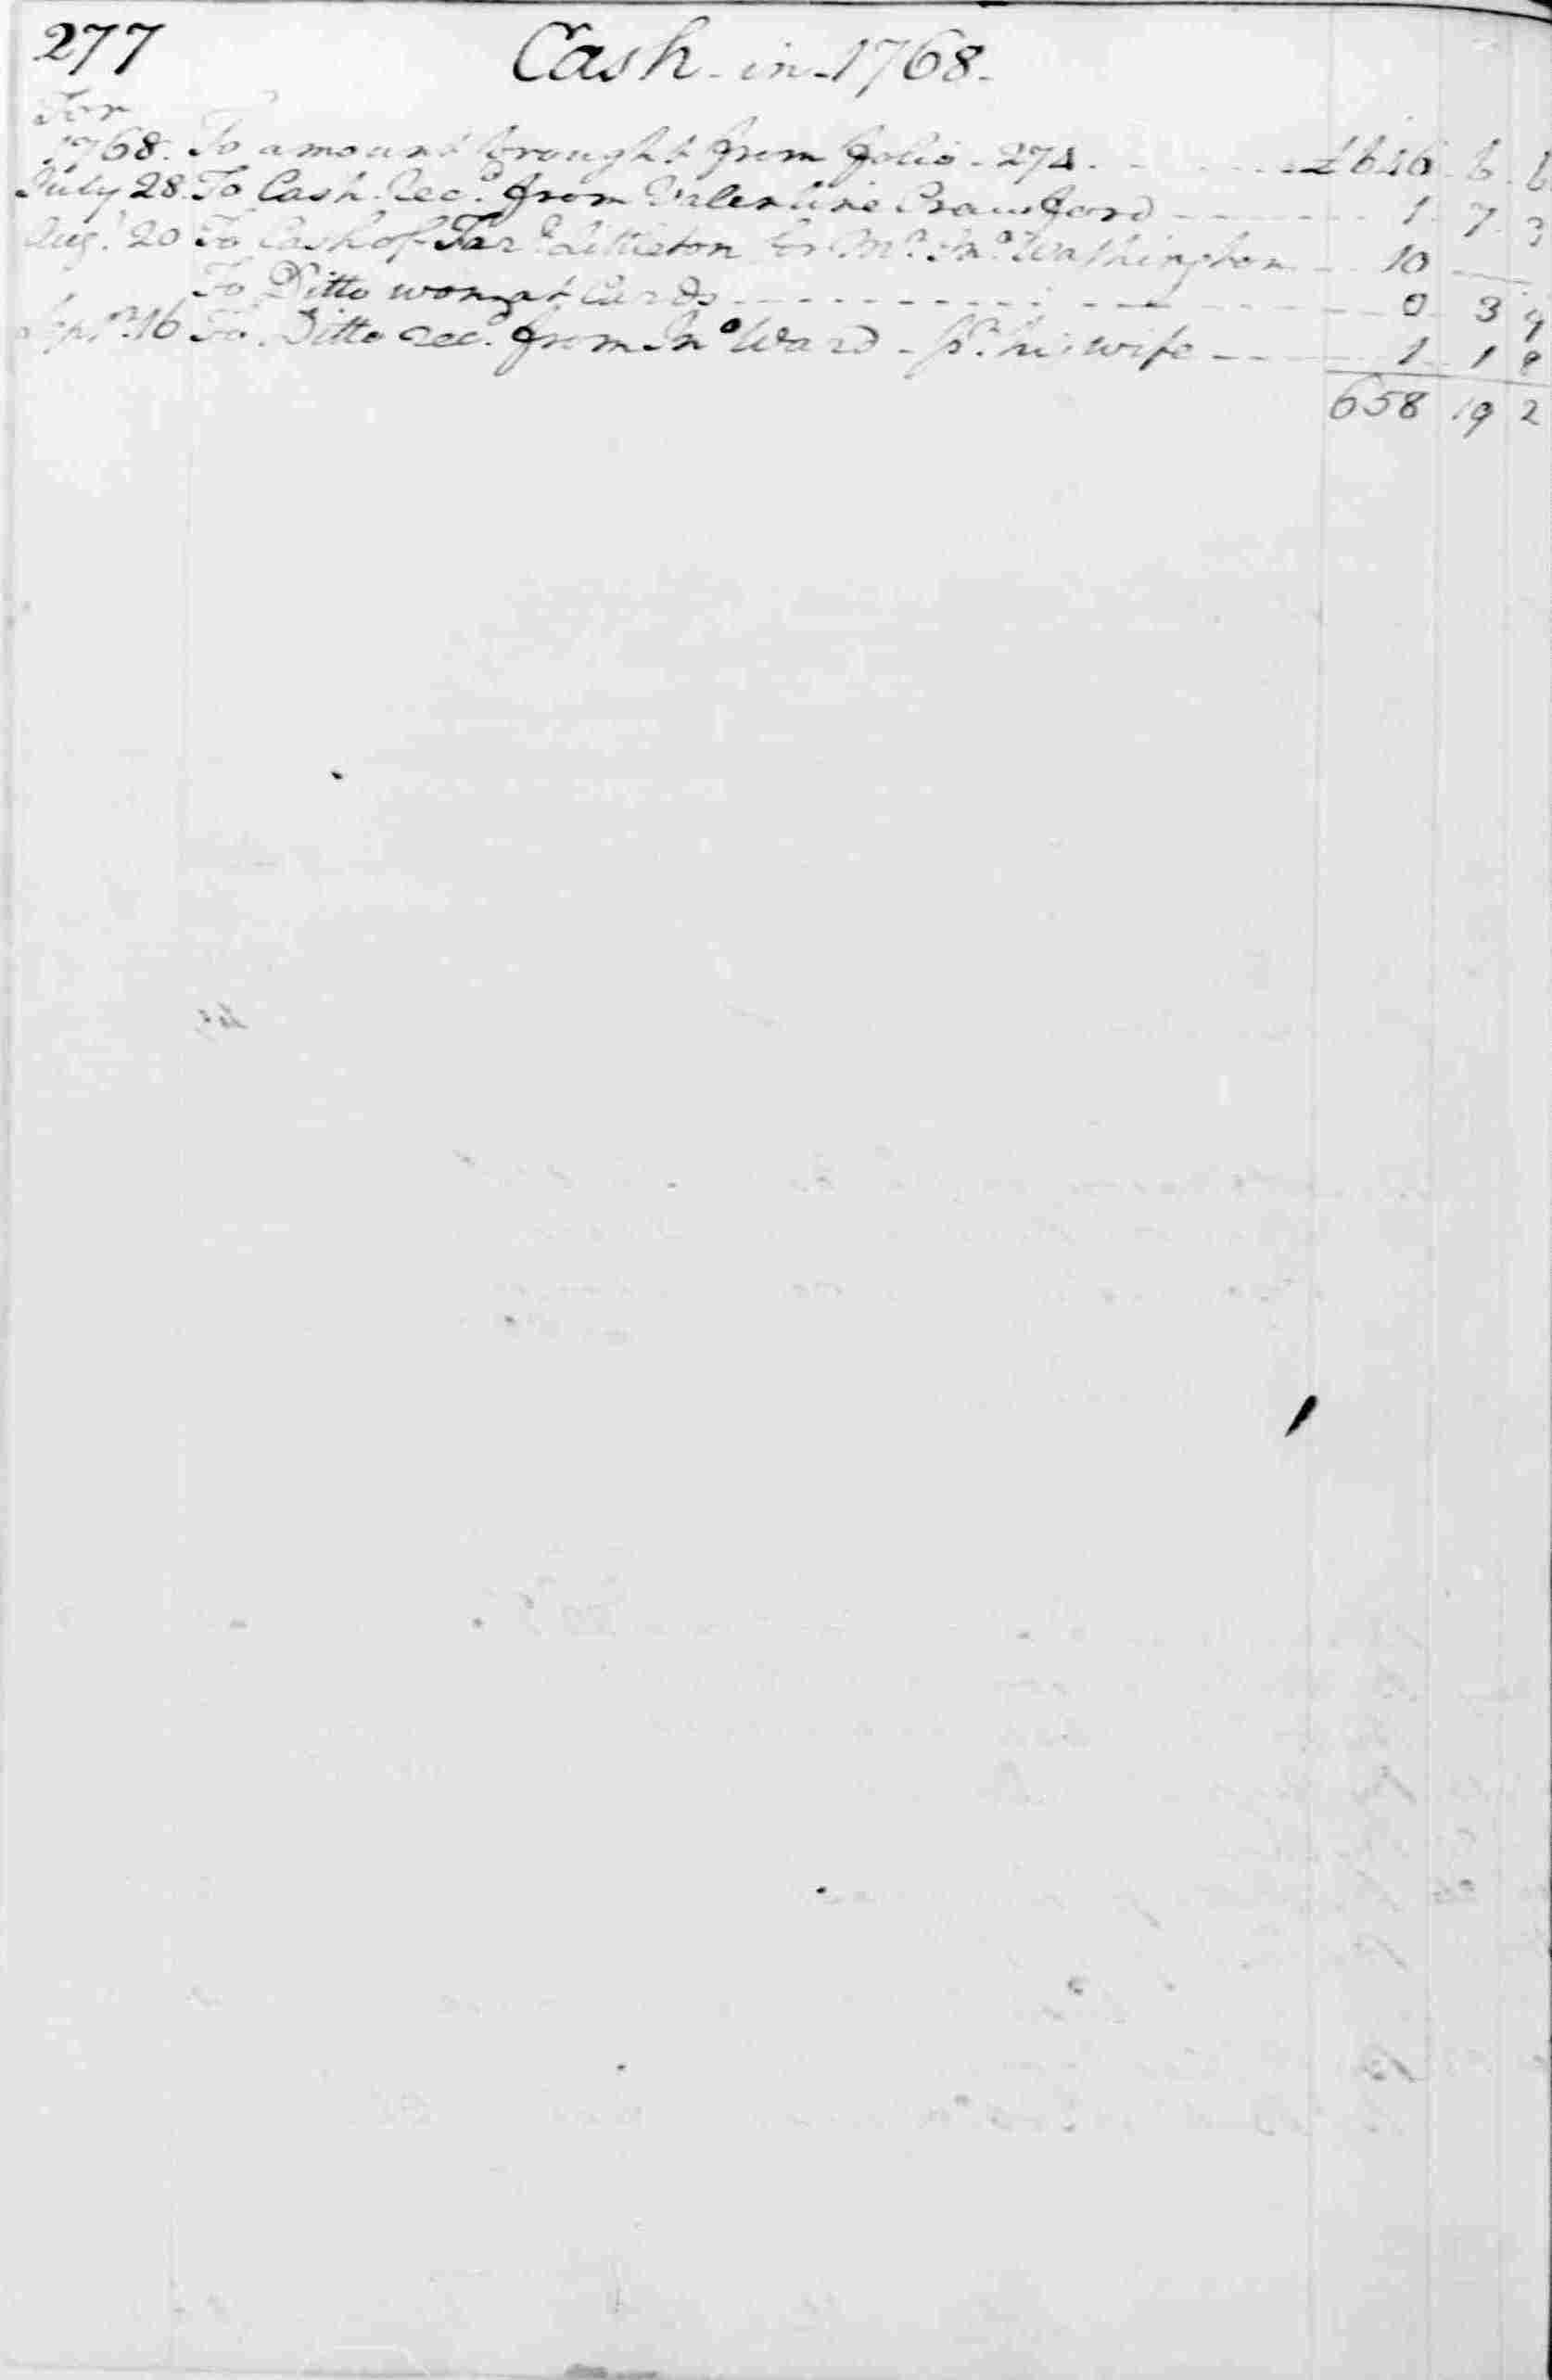 Ledger A, folio 277, left side